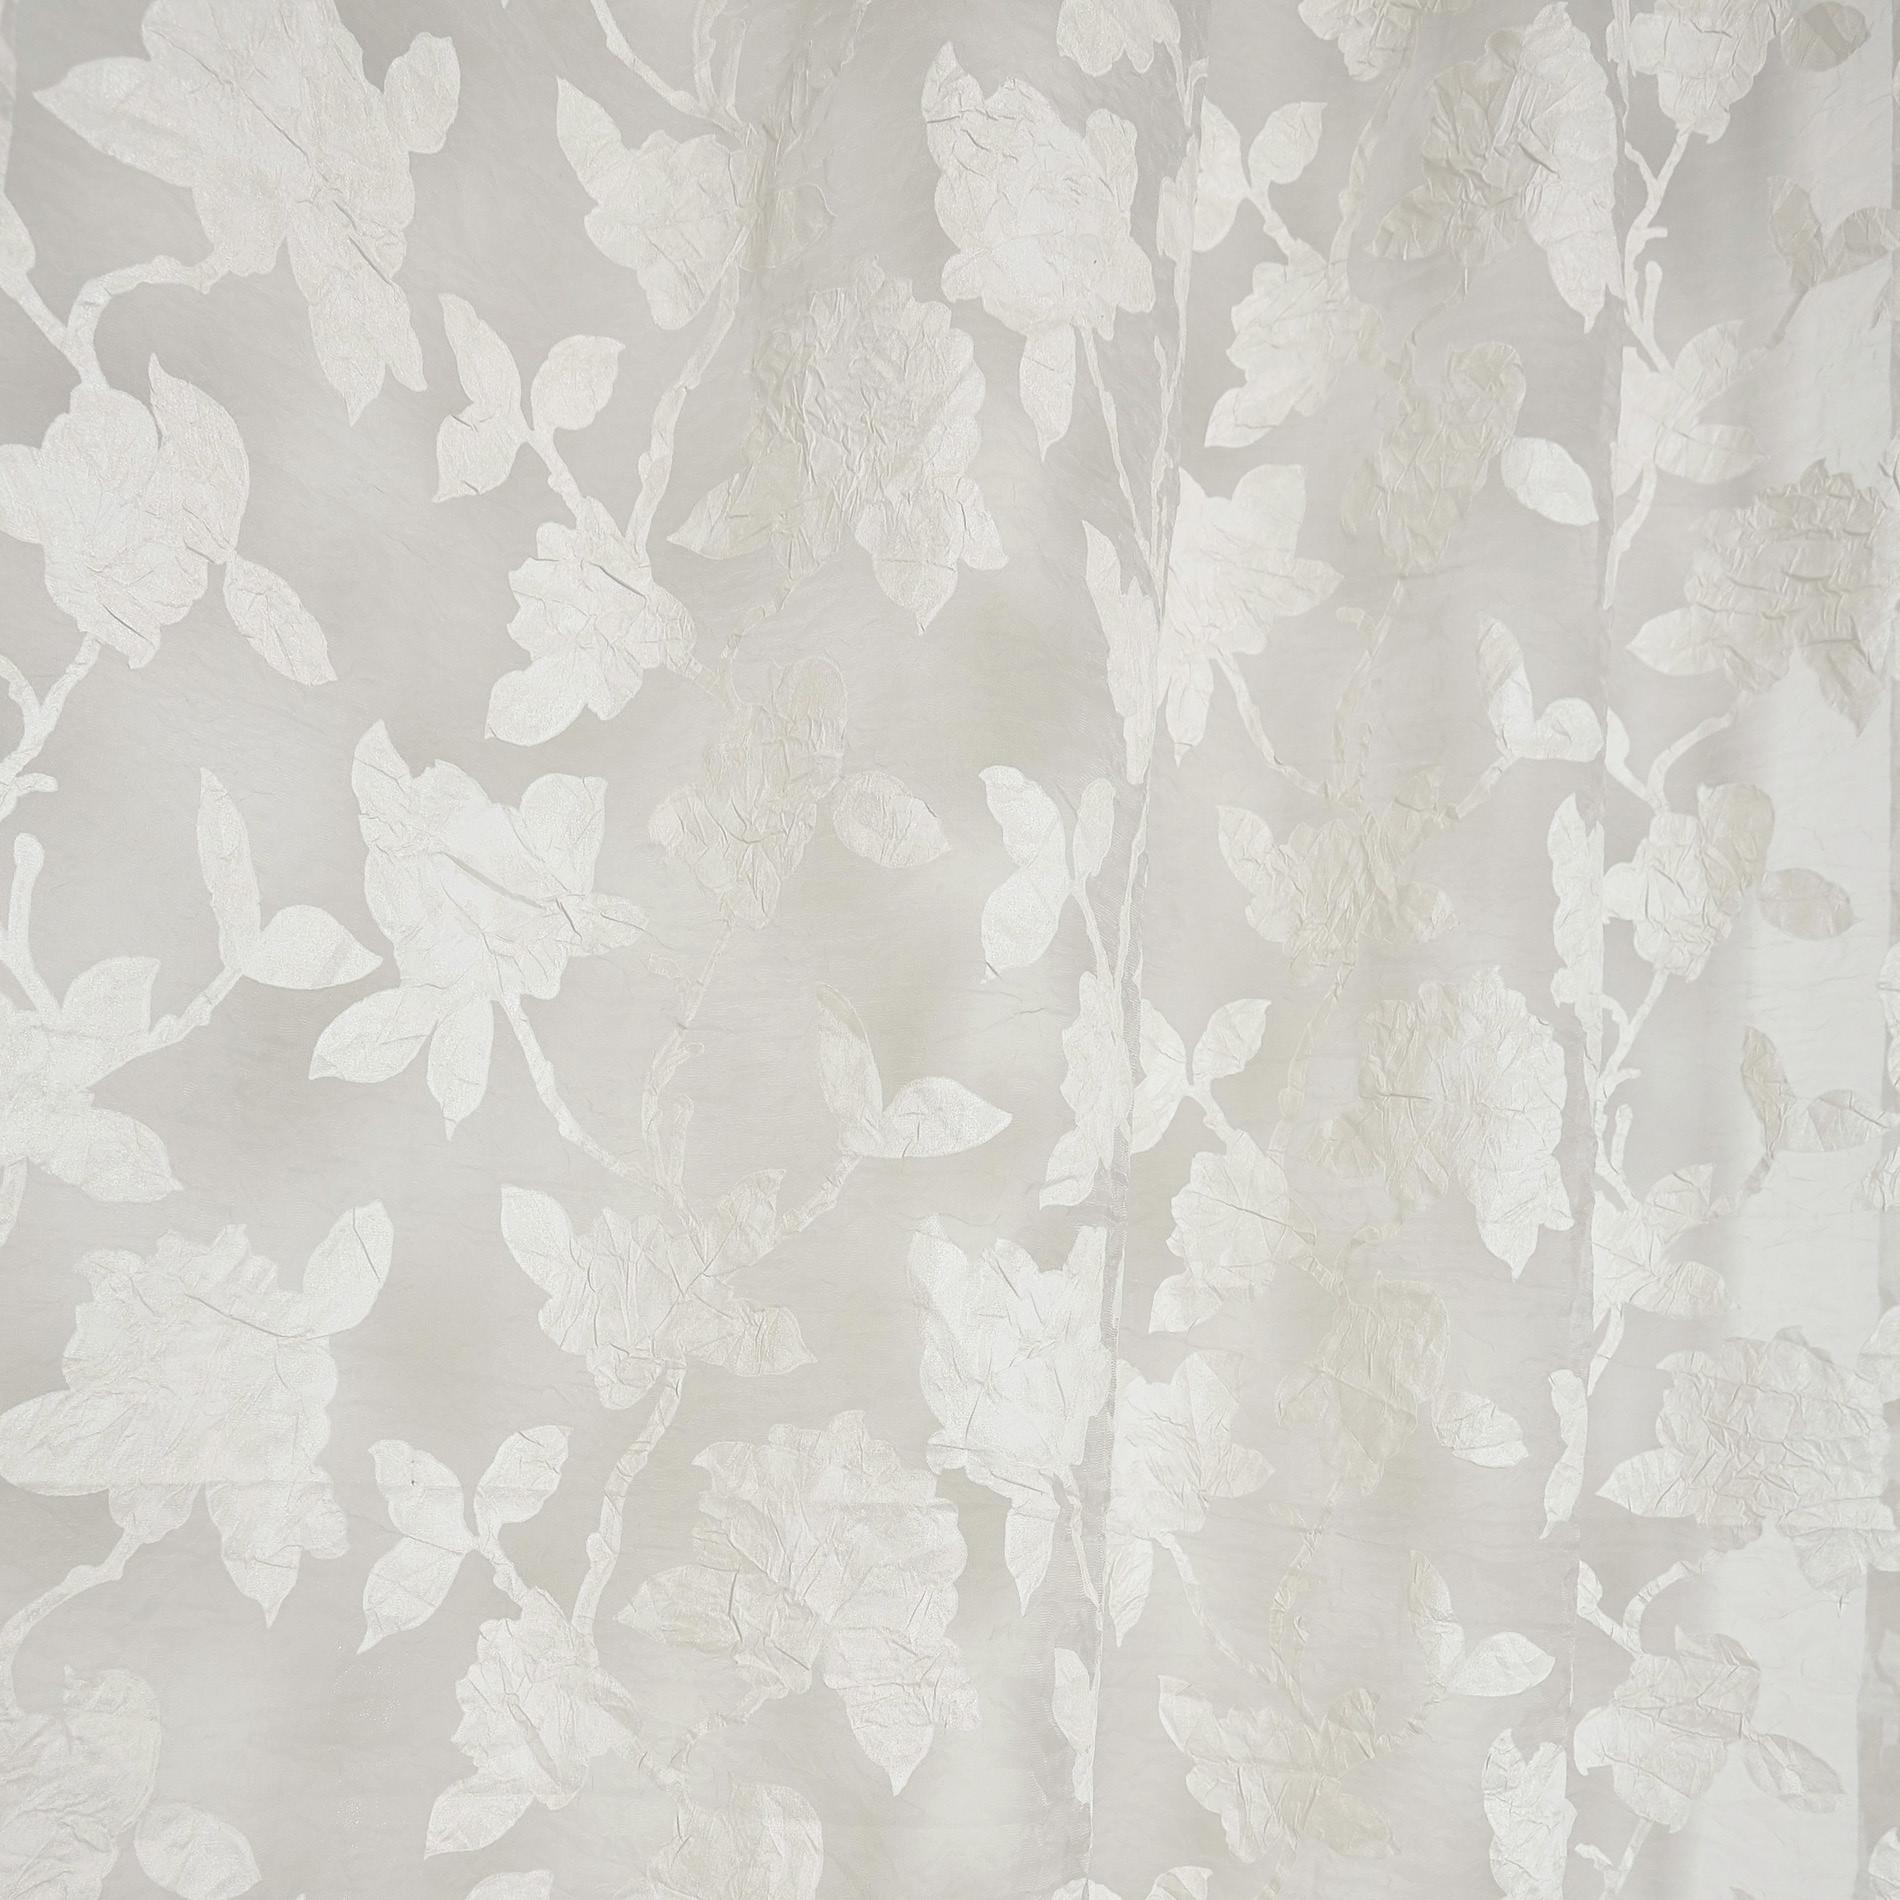 Tenda stampa rose devore, Bianco, large image number 0